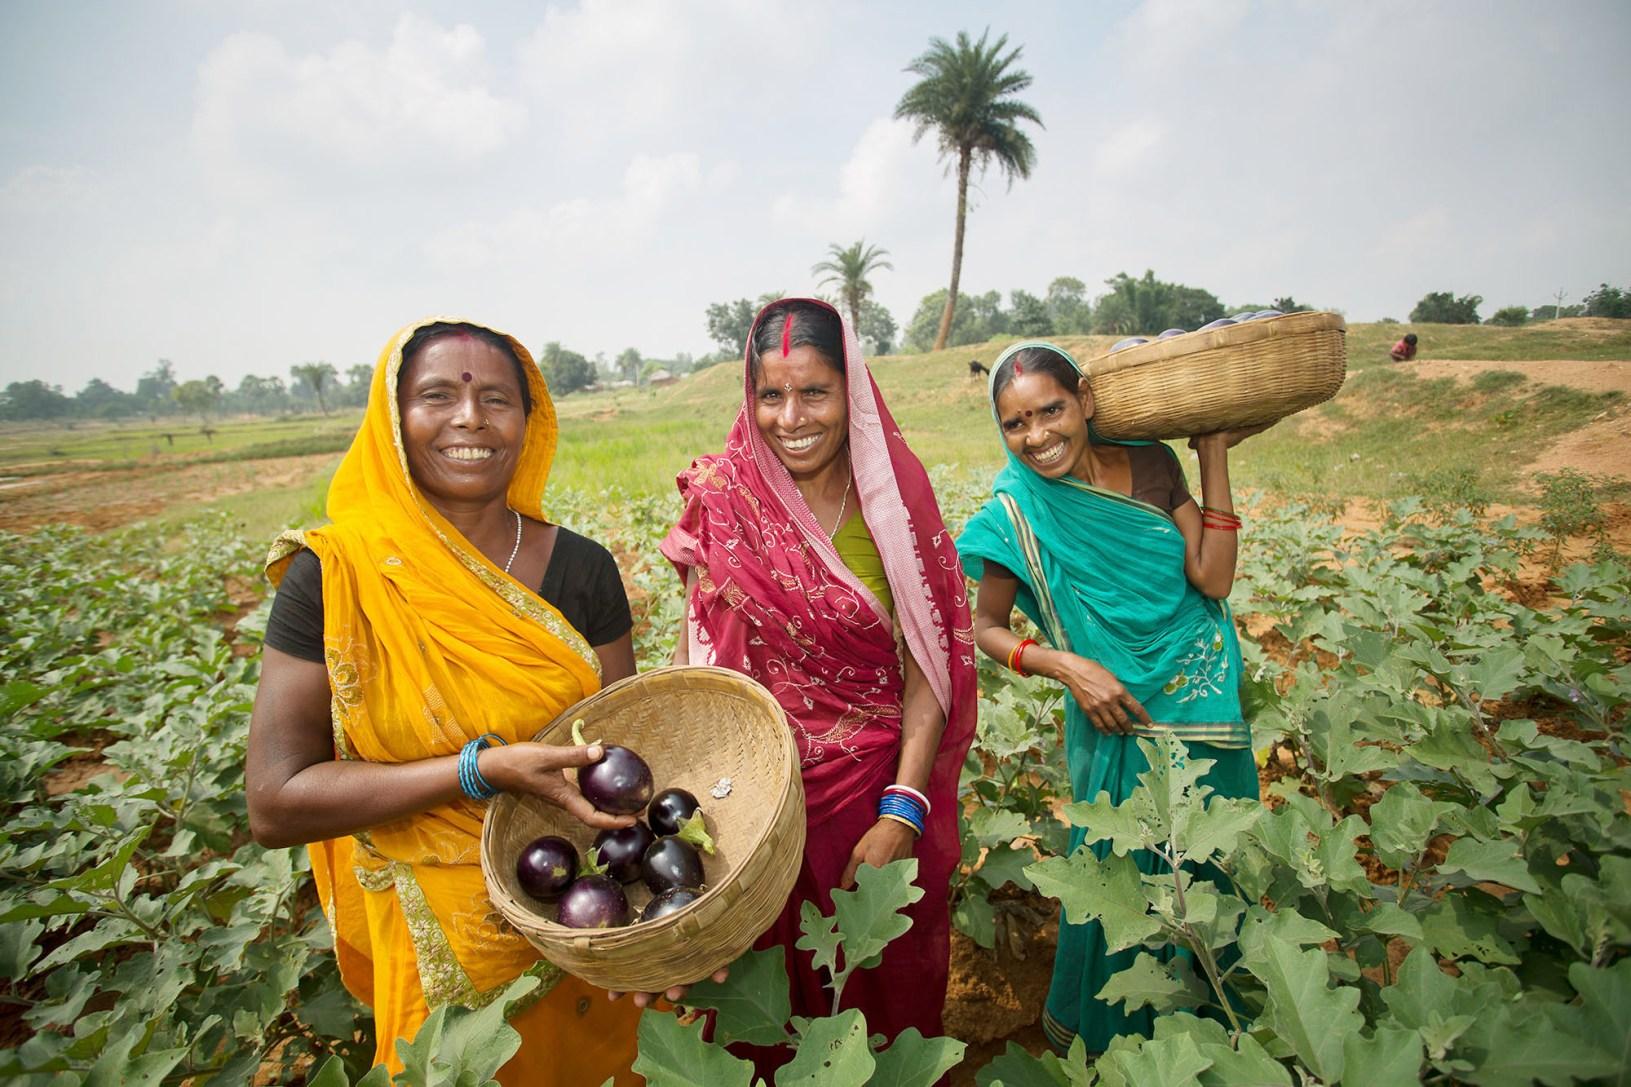 Women harvest eggplant together in Bihar, India.